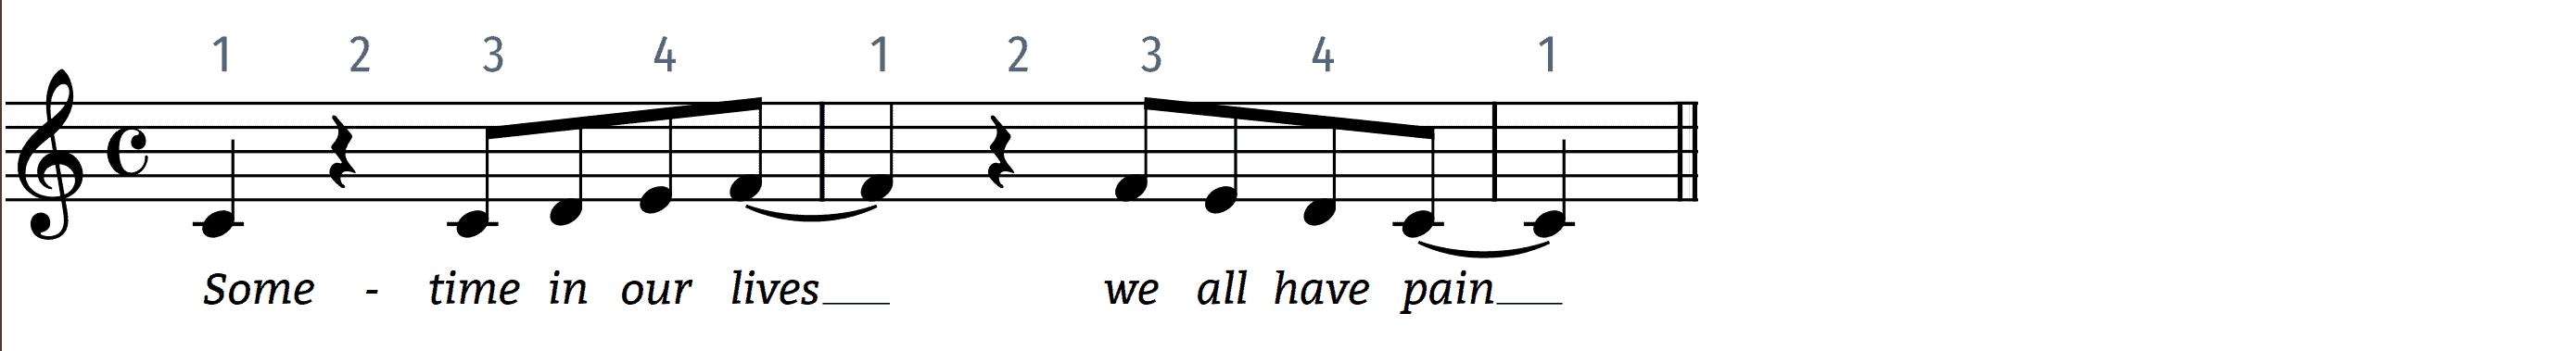 lean on me with the original rhythm